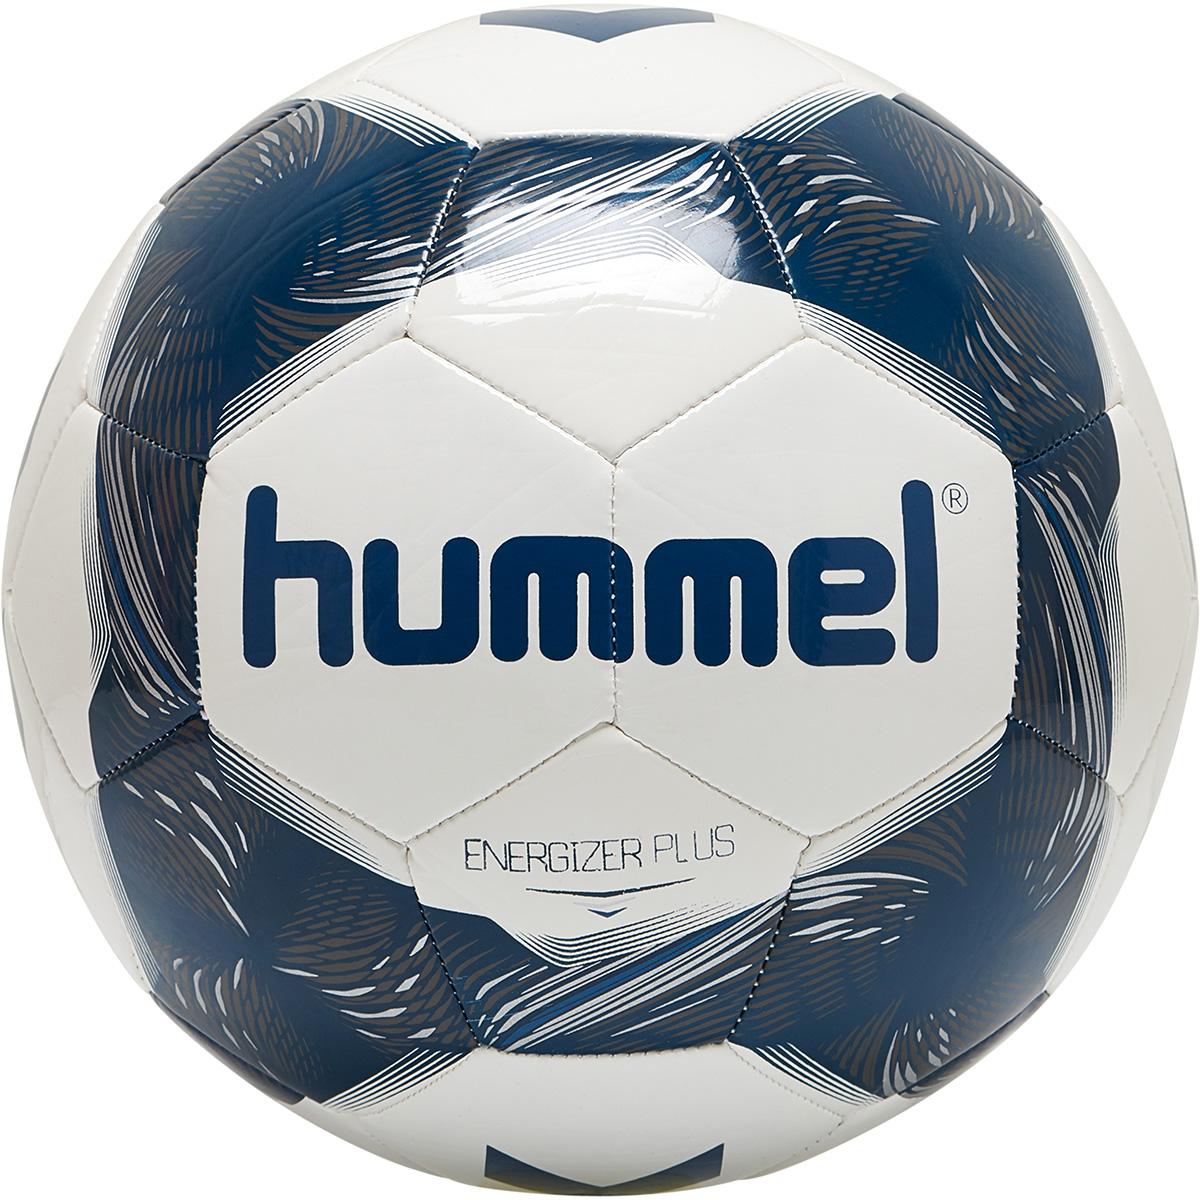 Hummel Energizer Plus Loyalitet – Fußball Trainingsball – 87588631-9109 weiß/blau